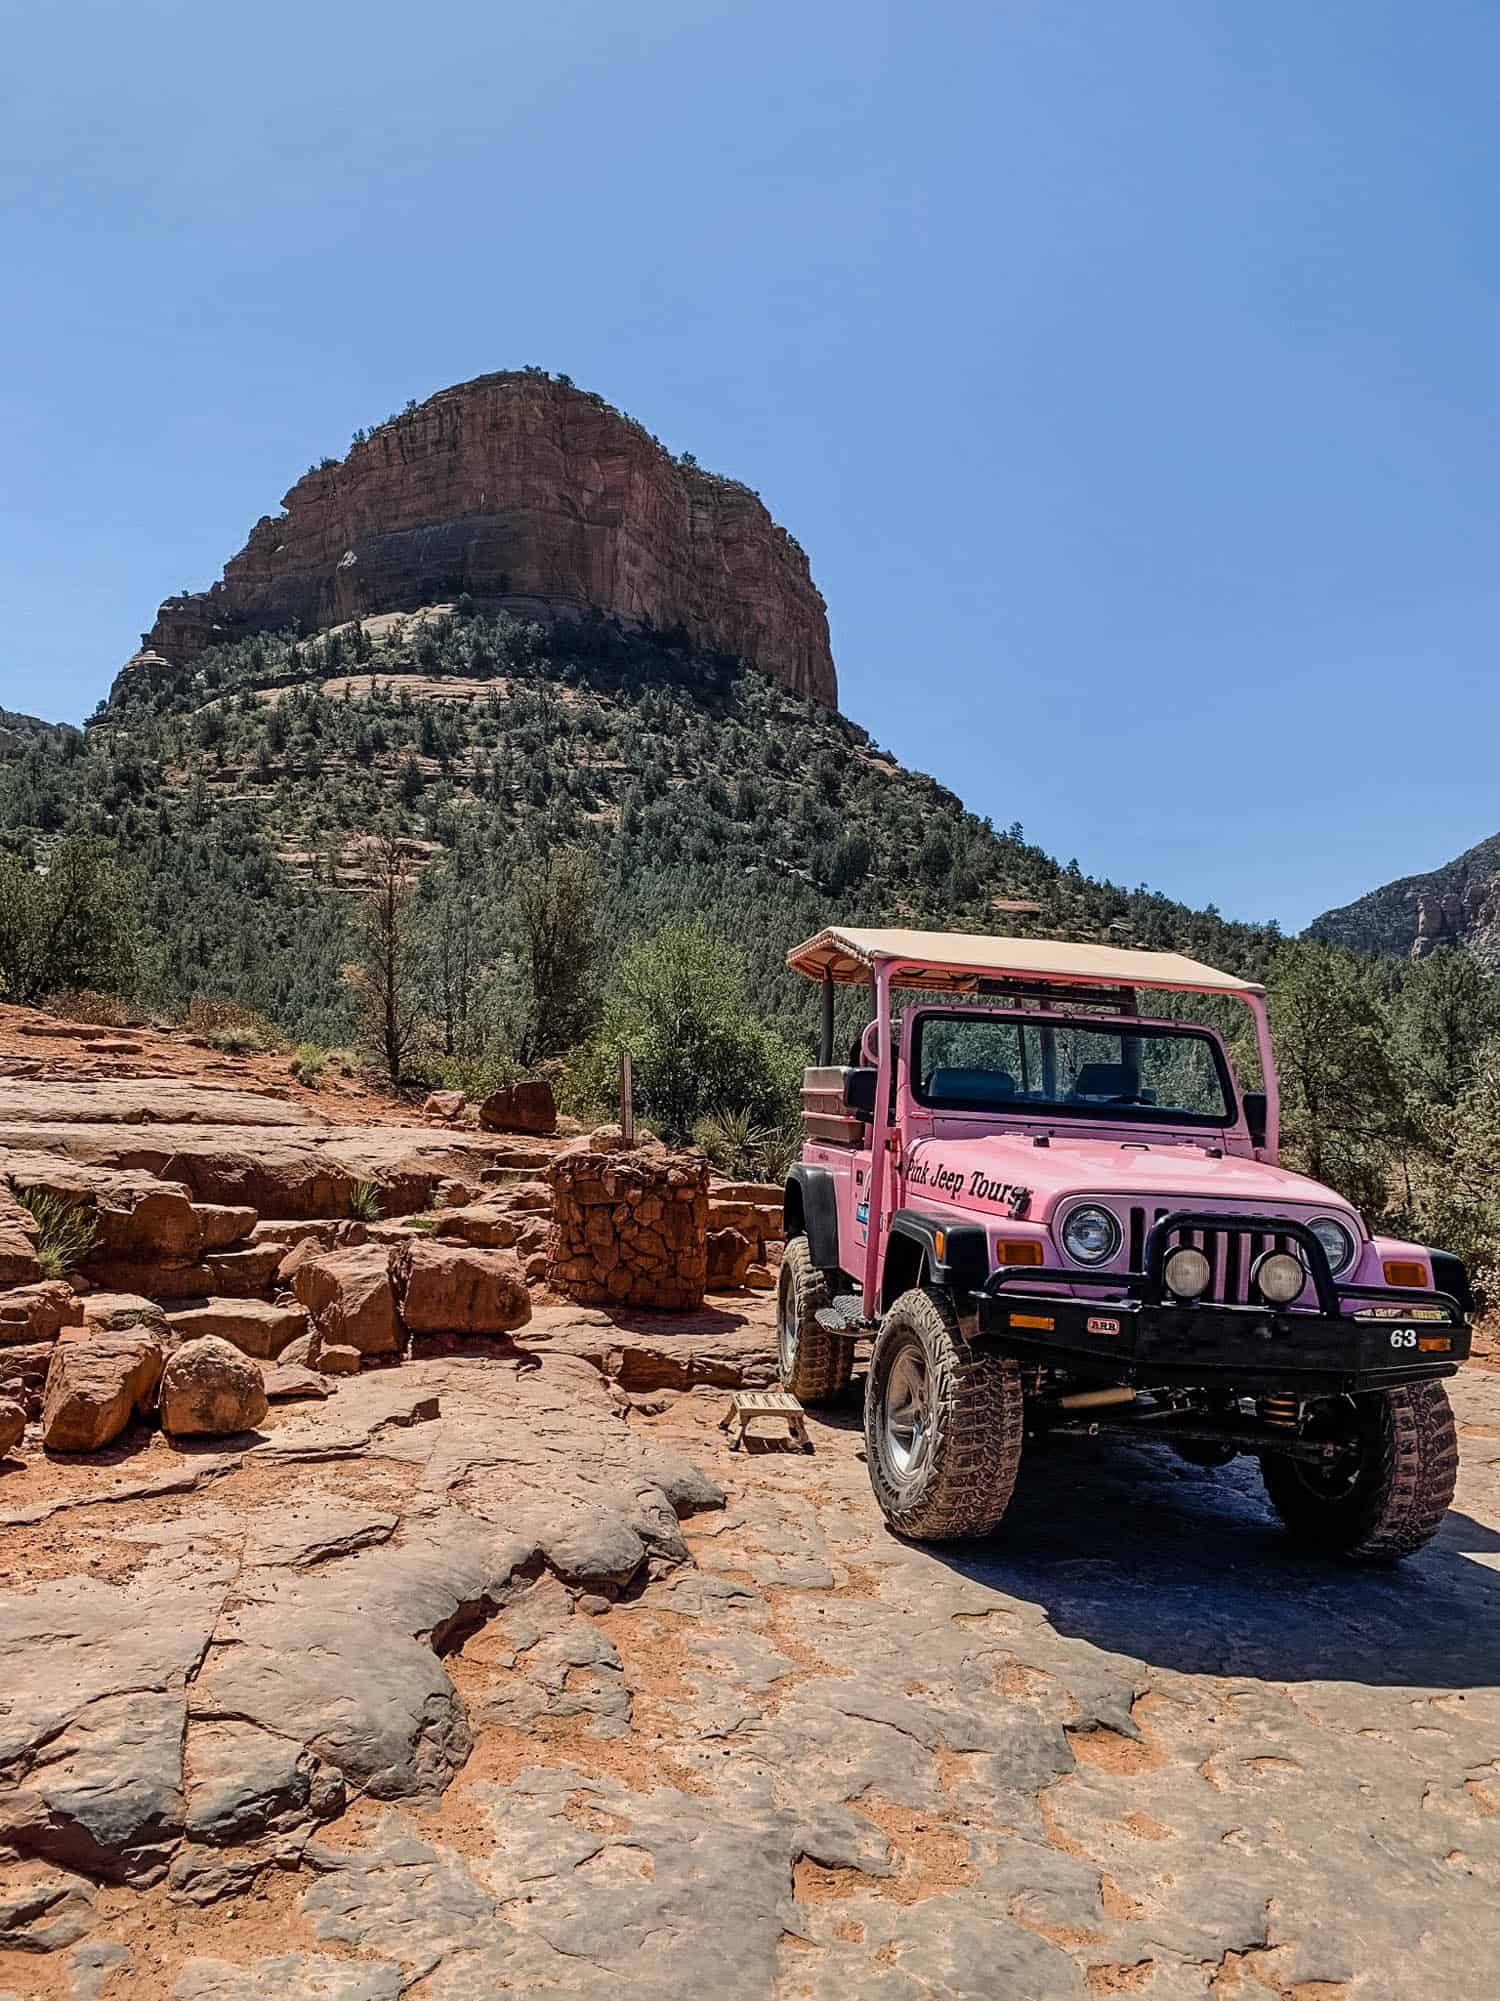 8 Day Itinerary In Arizona